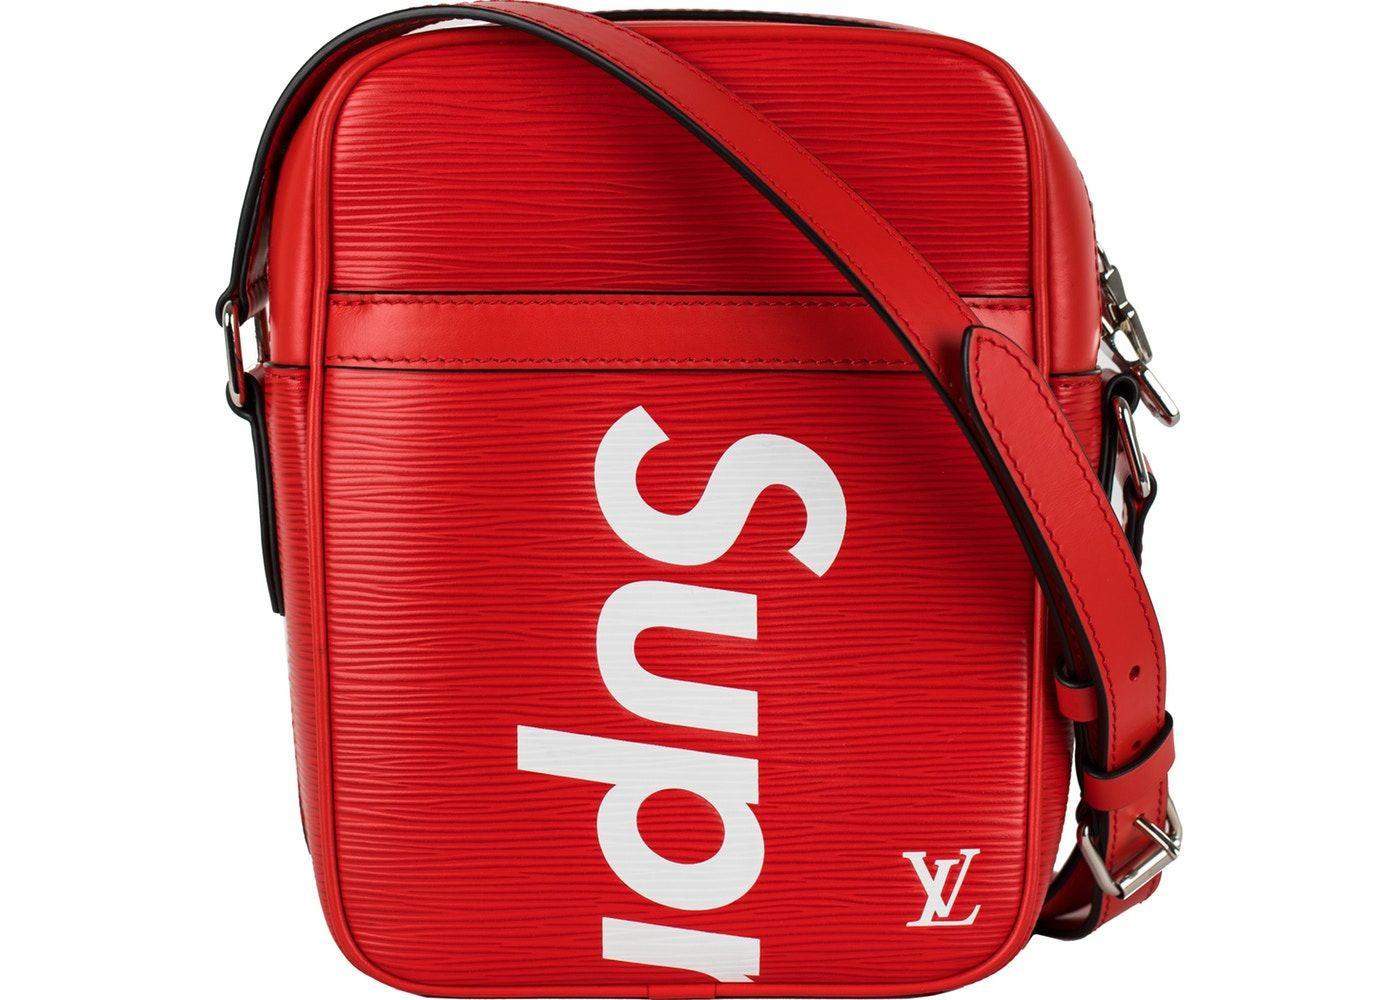 e3af8692160 Louis Vuitton x Supreme Danube Epi PM Red | Red / White / Black ...